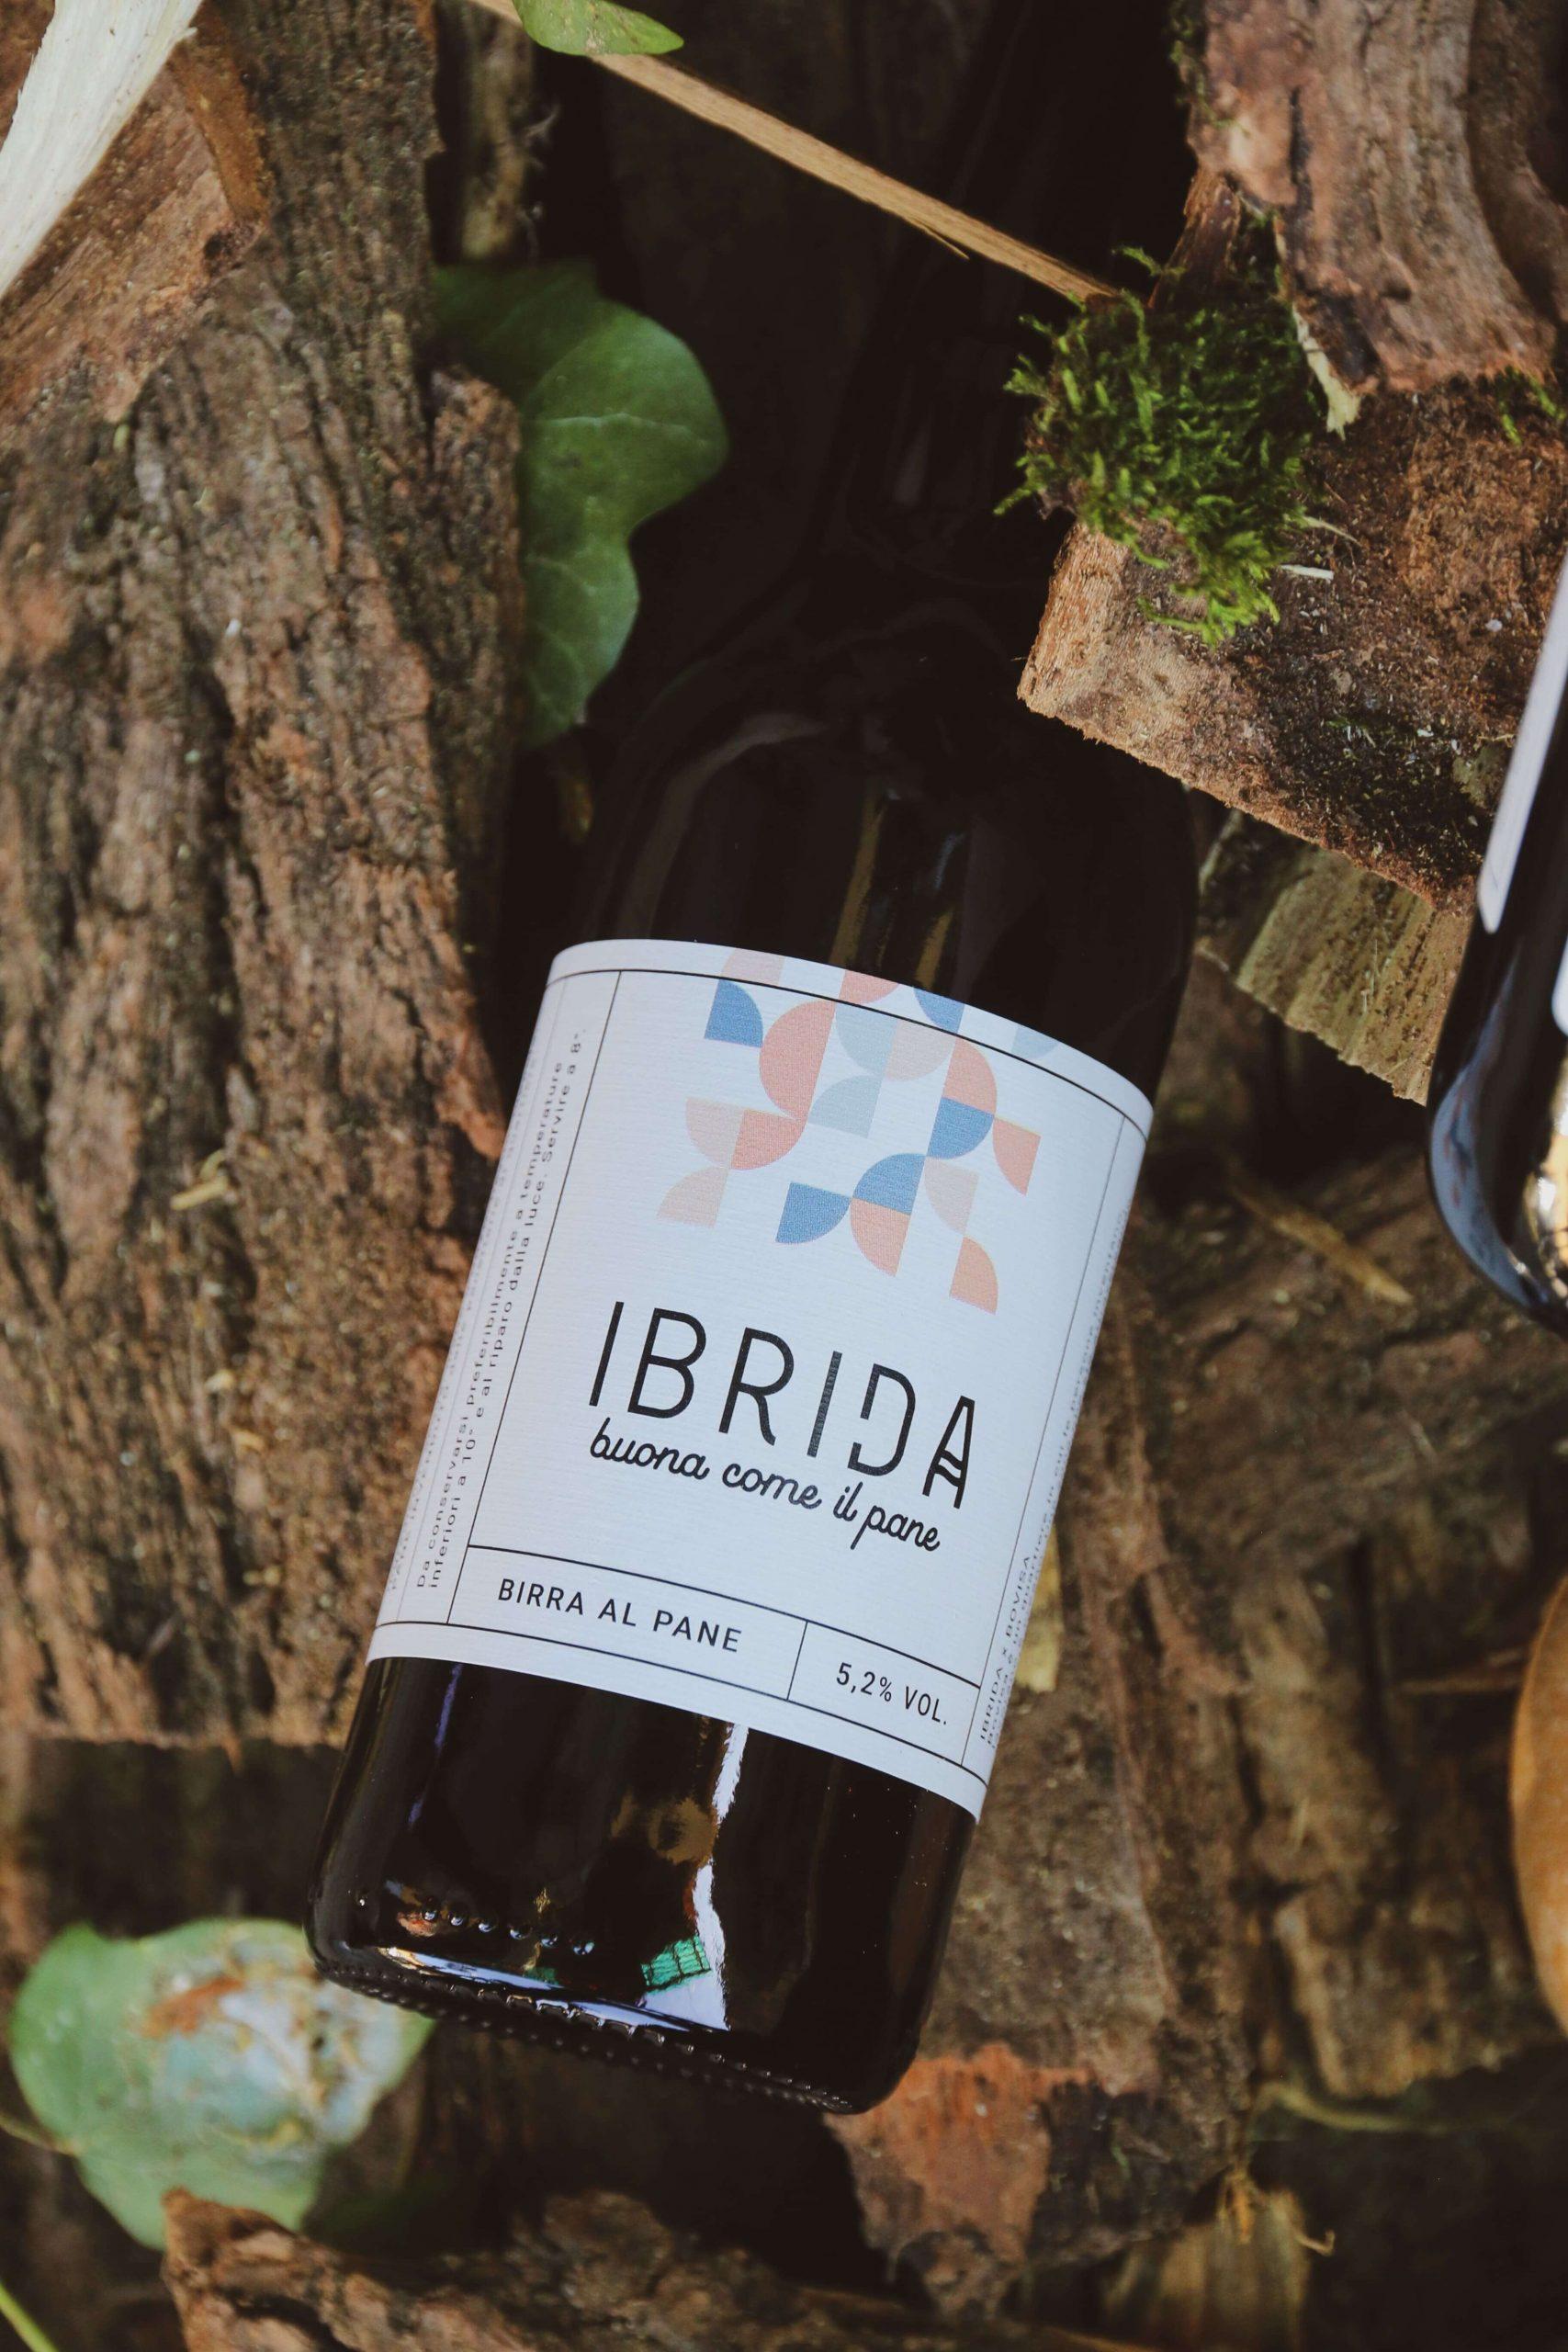 Ibrida Birra in the wild